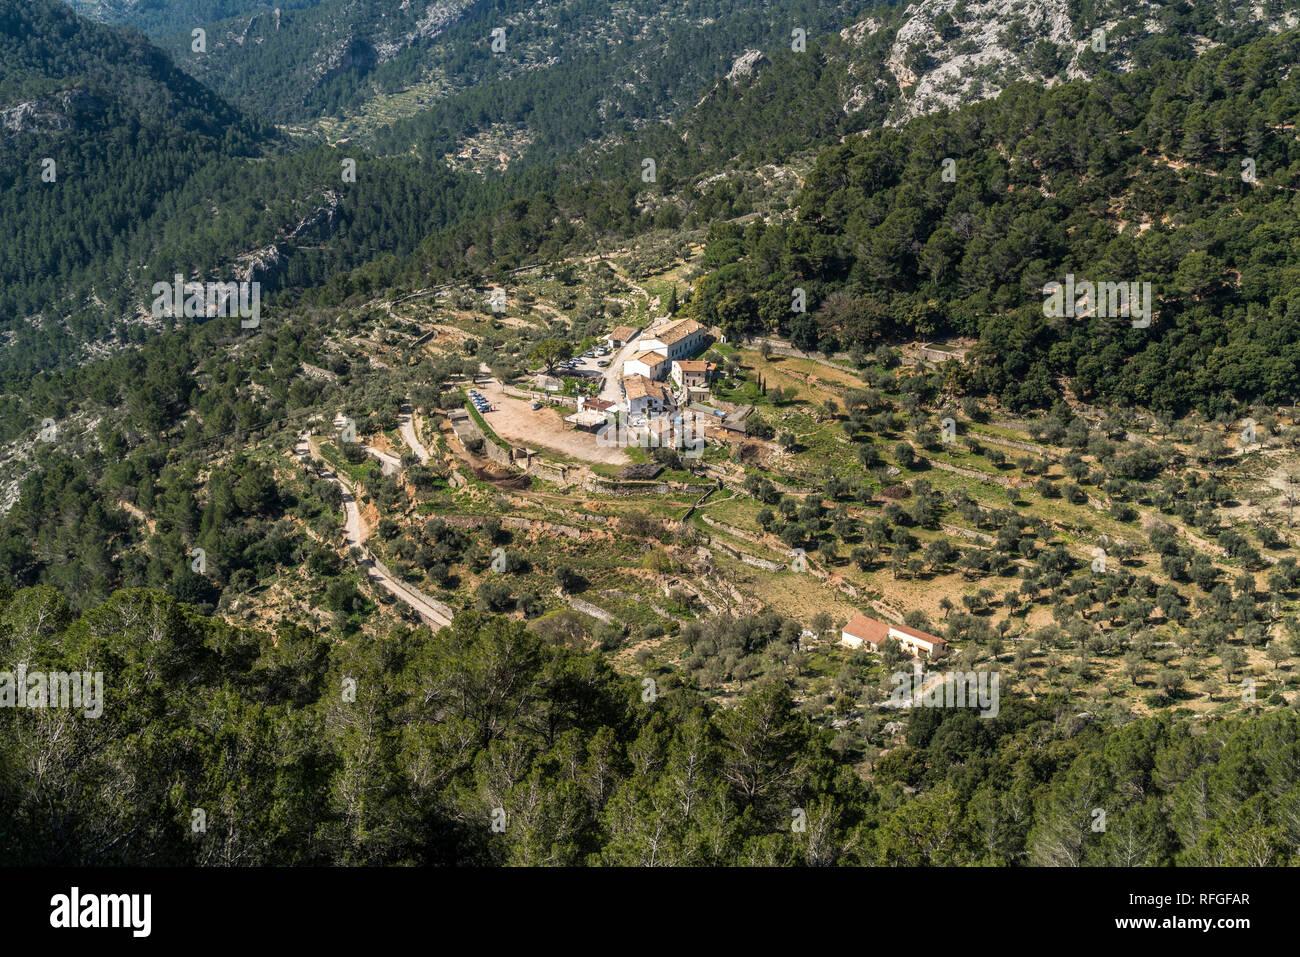 Blick auf die Finca Es Verger bei Alaro im Gebirge der Serra de Tramuntana, Mallorca, Balearen, Spanien  |   Finca Es Verger near  Alaro, Serra de Tra - Stock Image